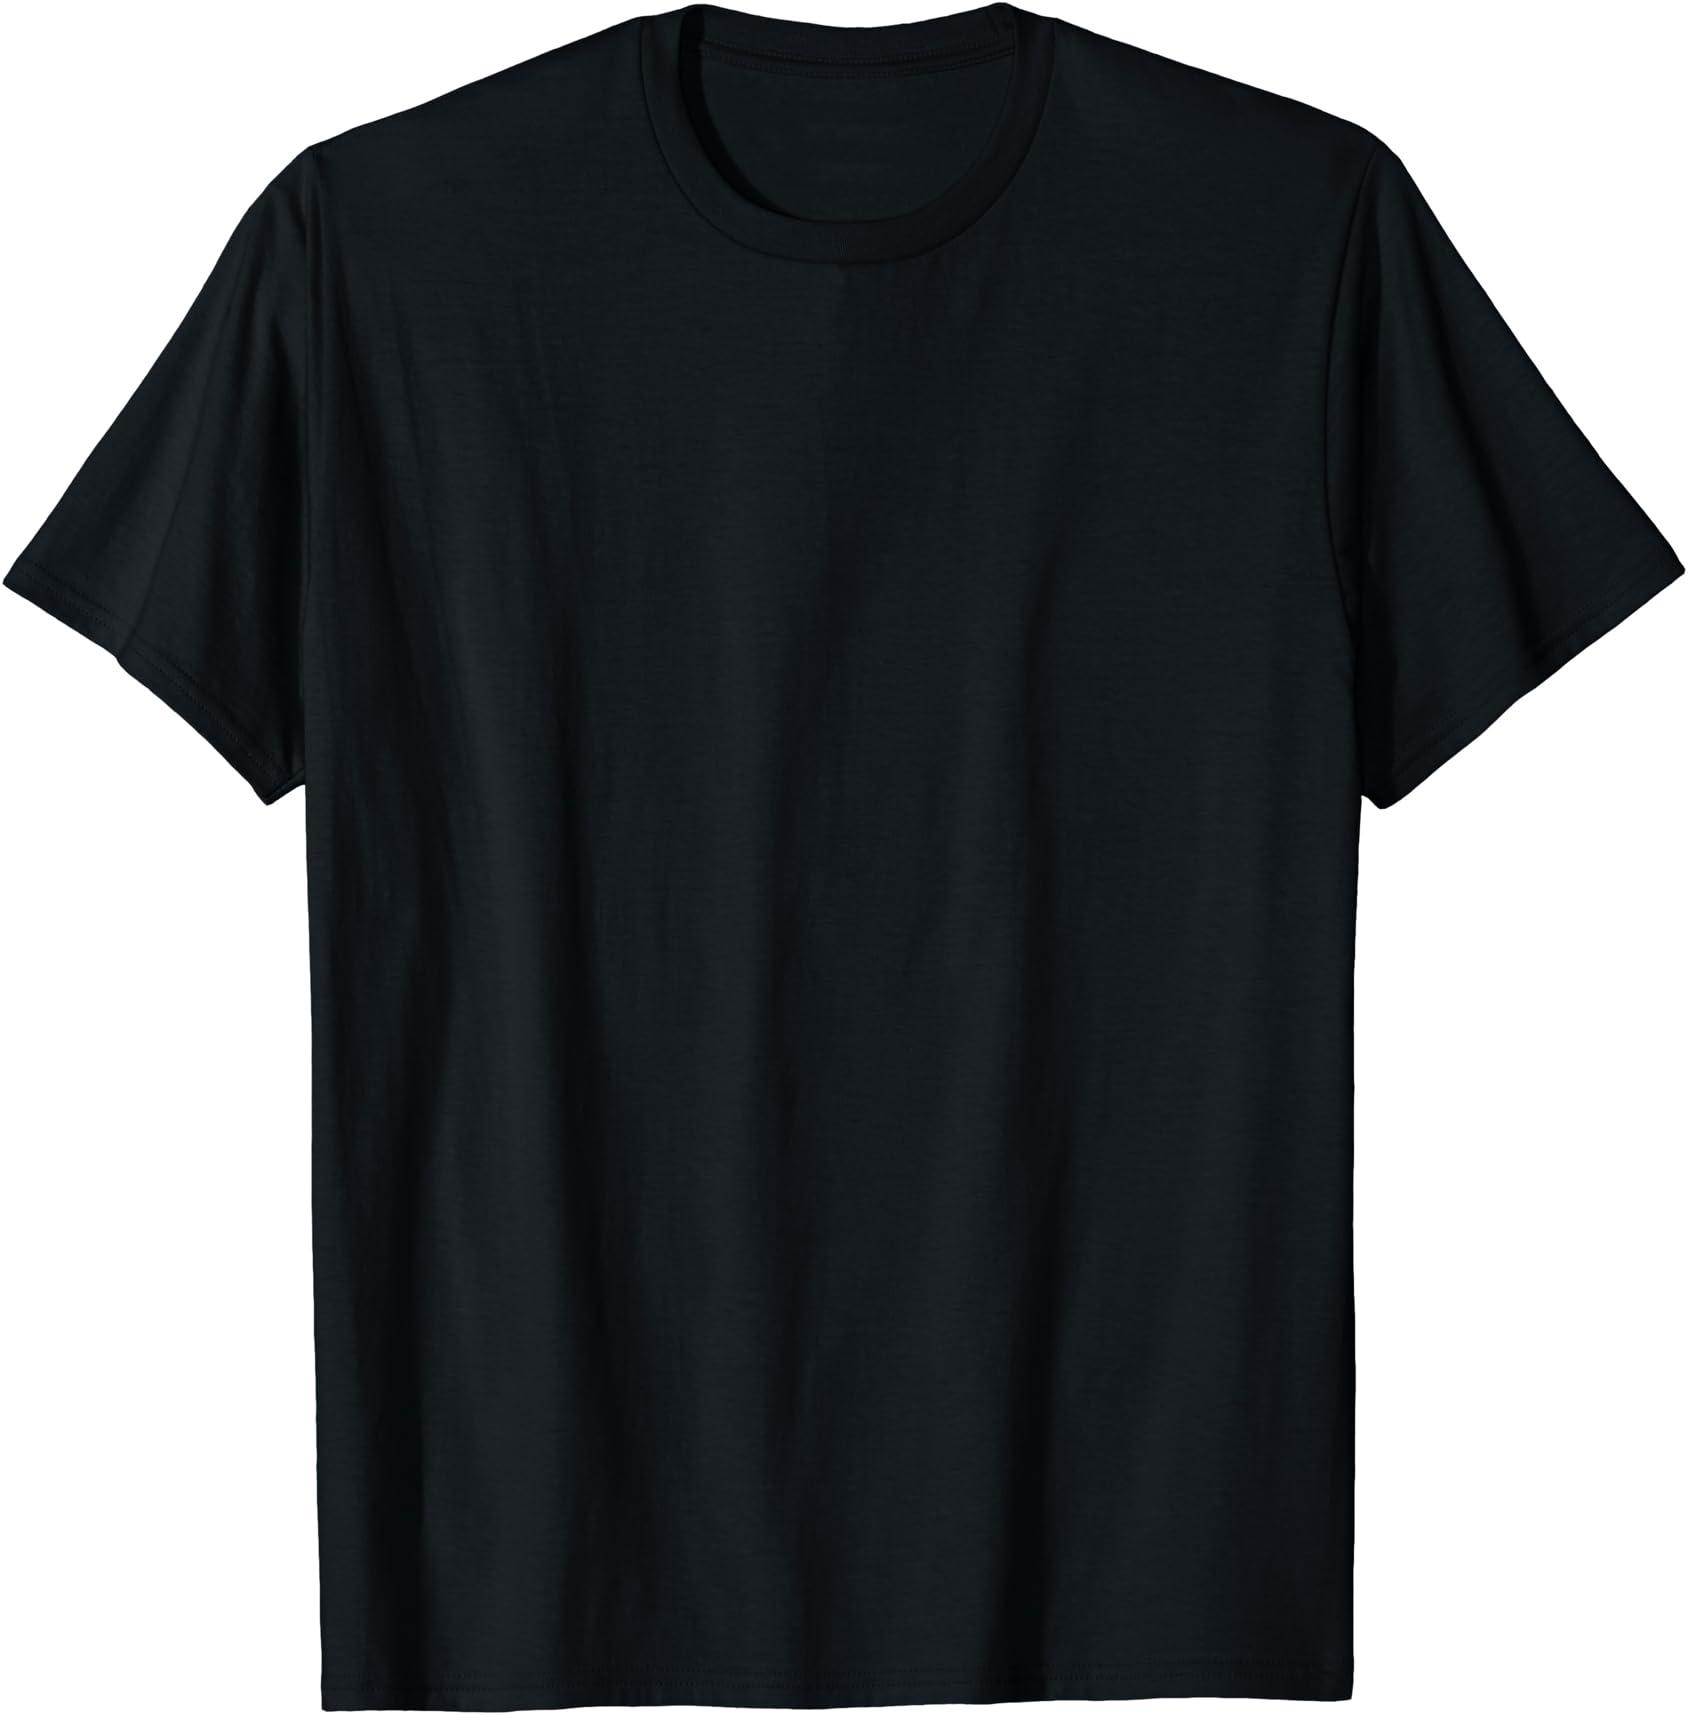 CNA Cool Tee Shirt Im A CNA Tshirt